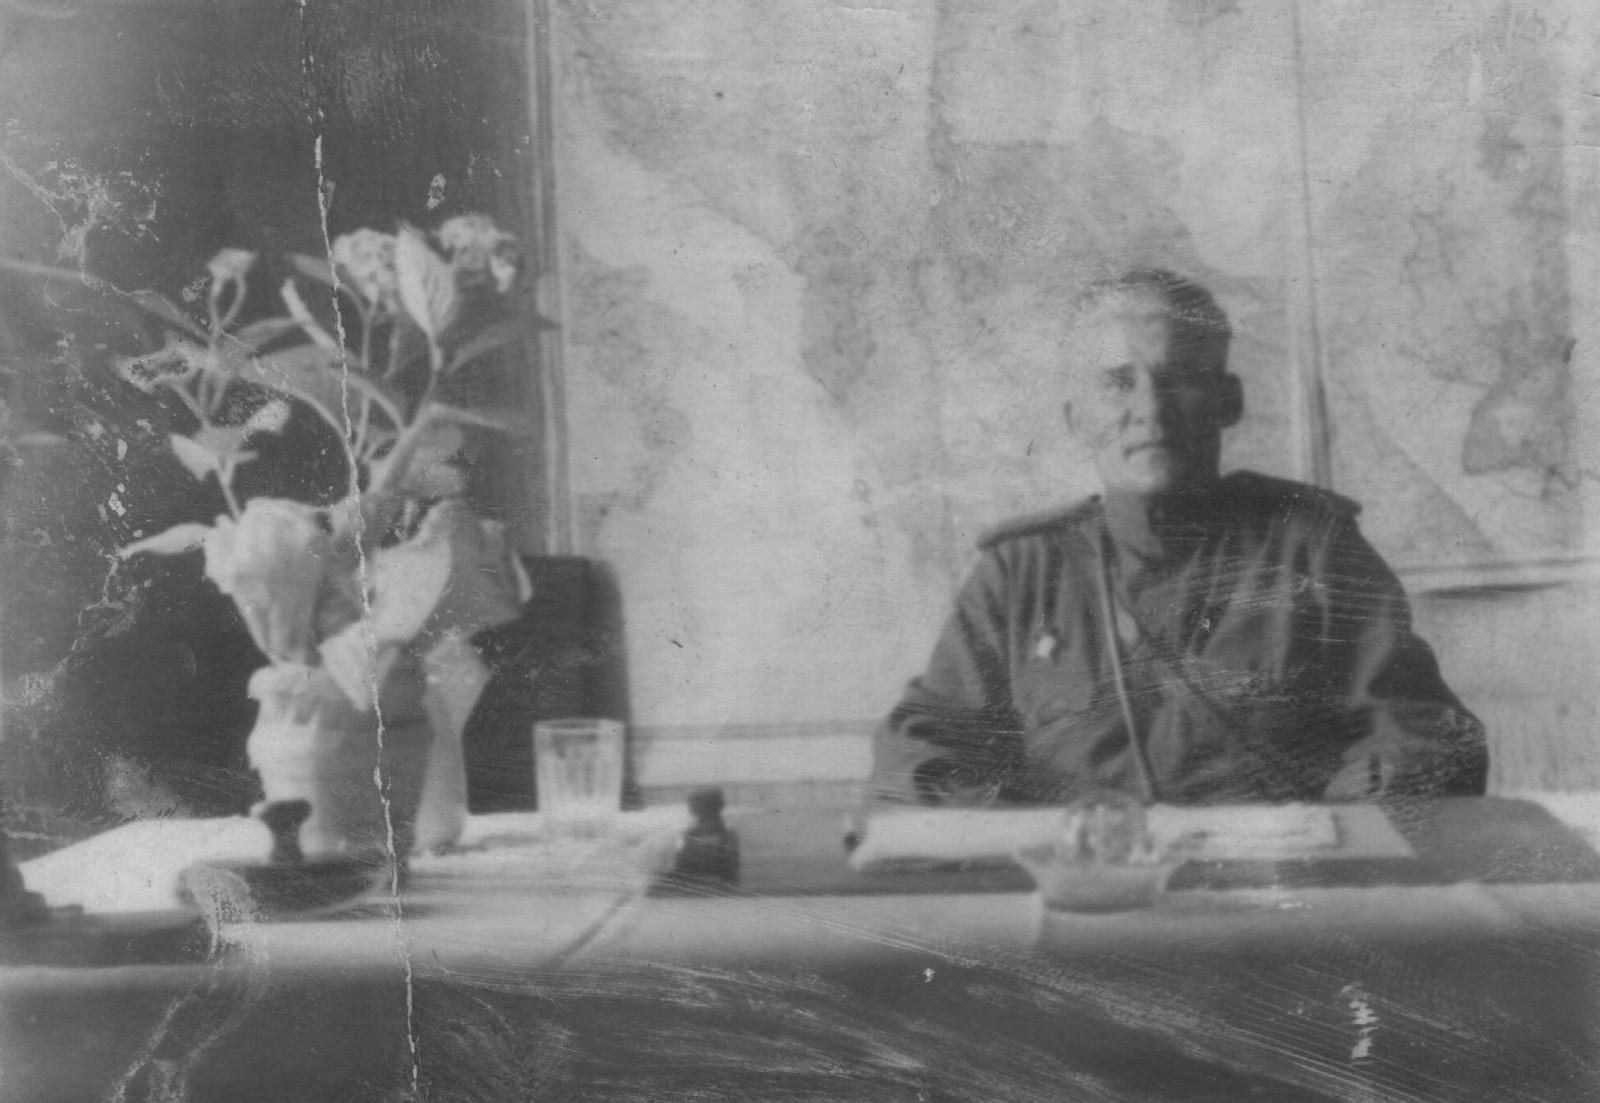 Дуров Н.А. Военный комендант г. Грац. 1945. Фото Маслова А.